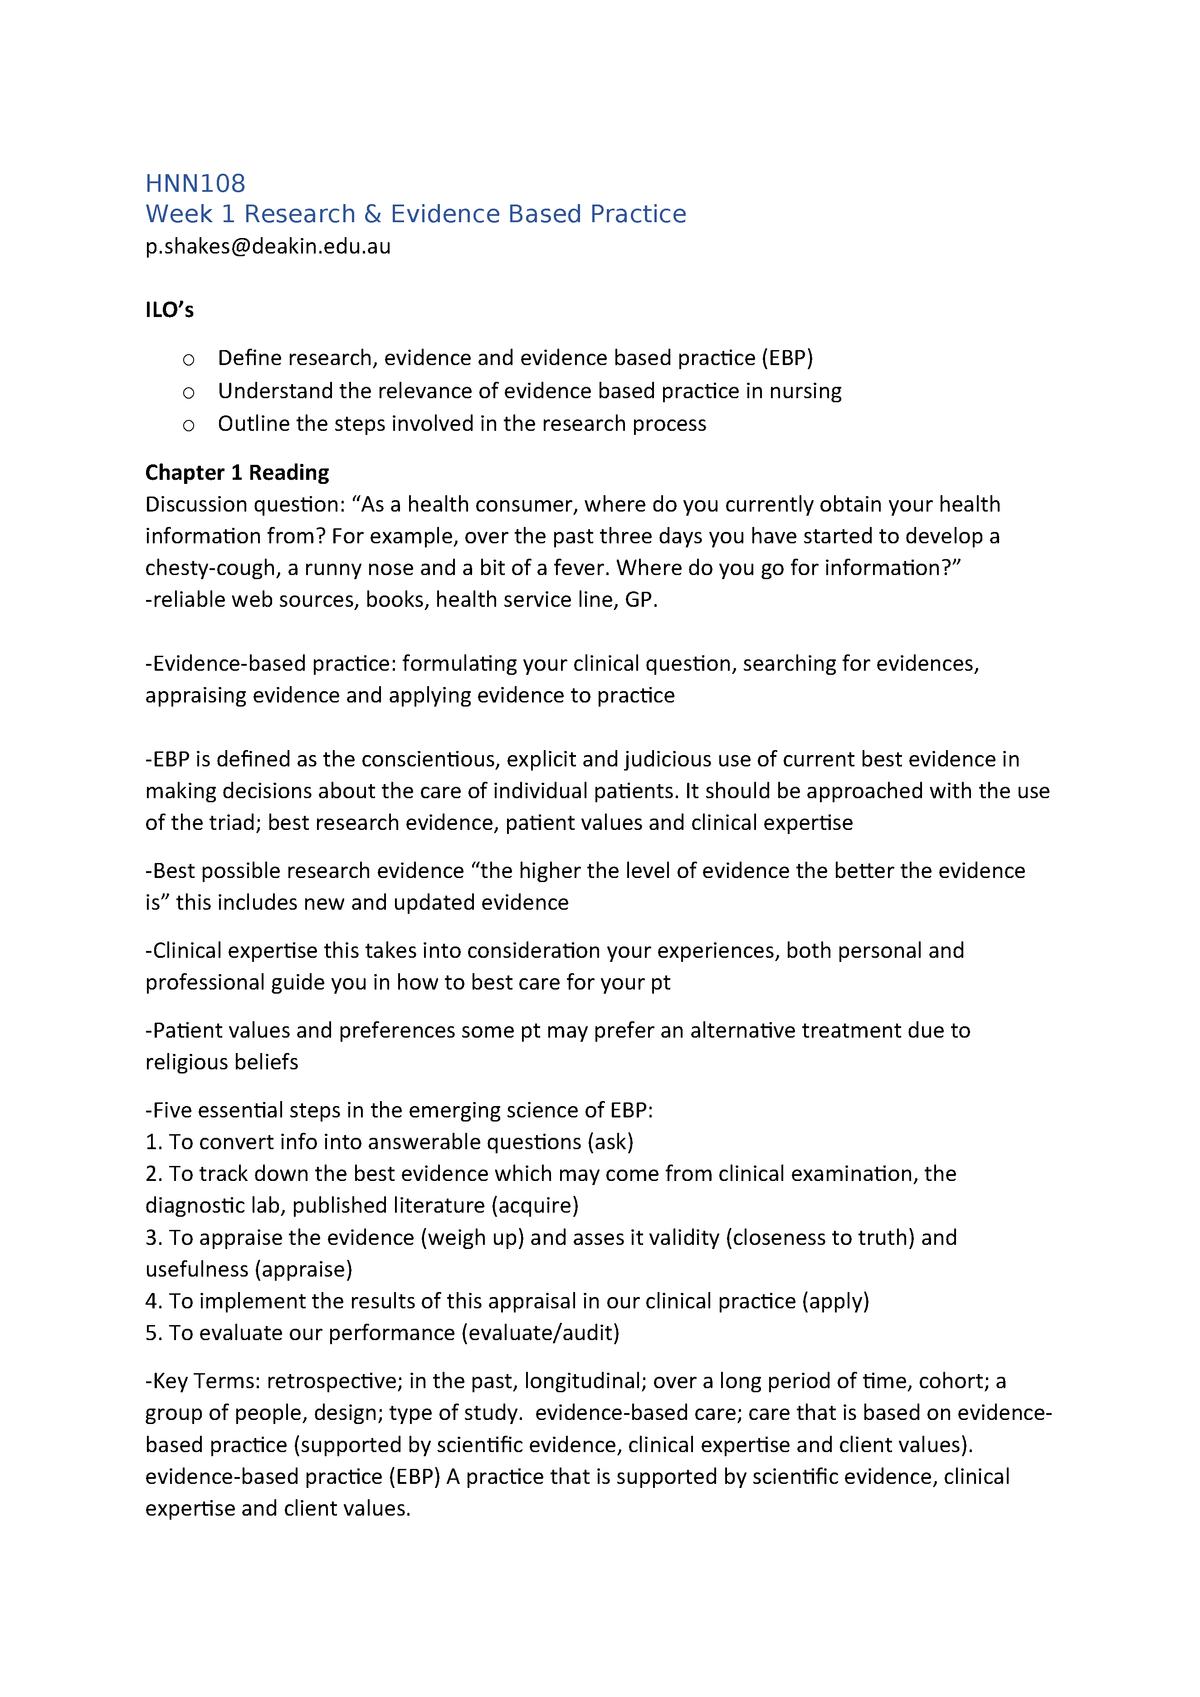 HNN108 Notes - Understanding Research Evidence - Deakin